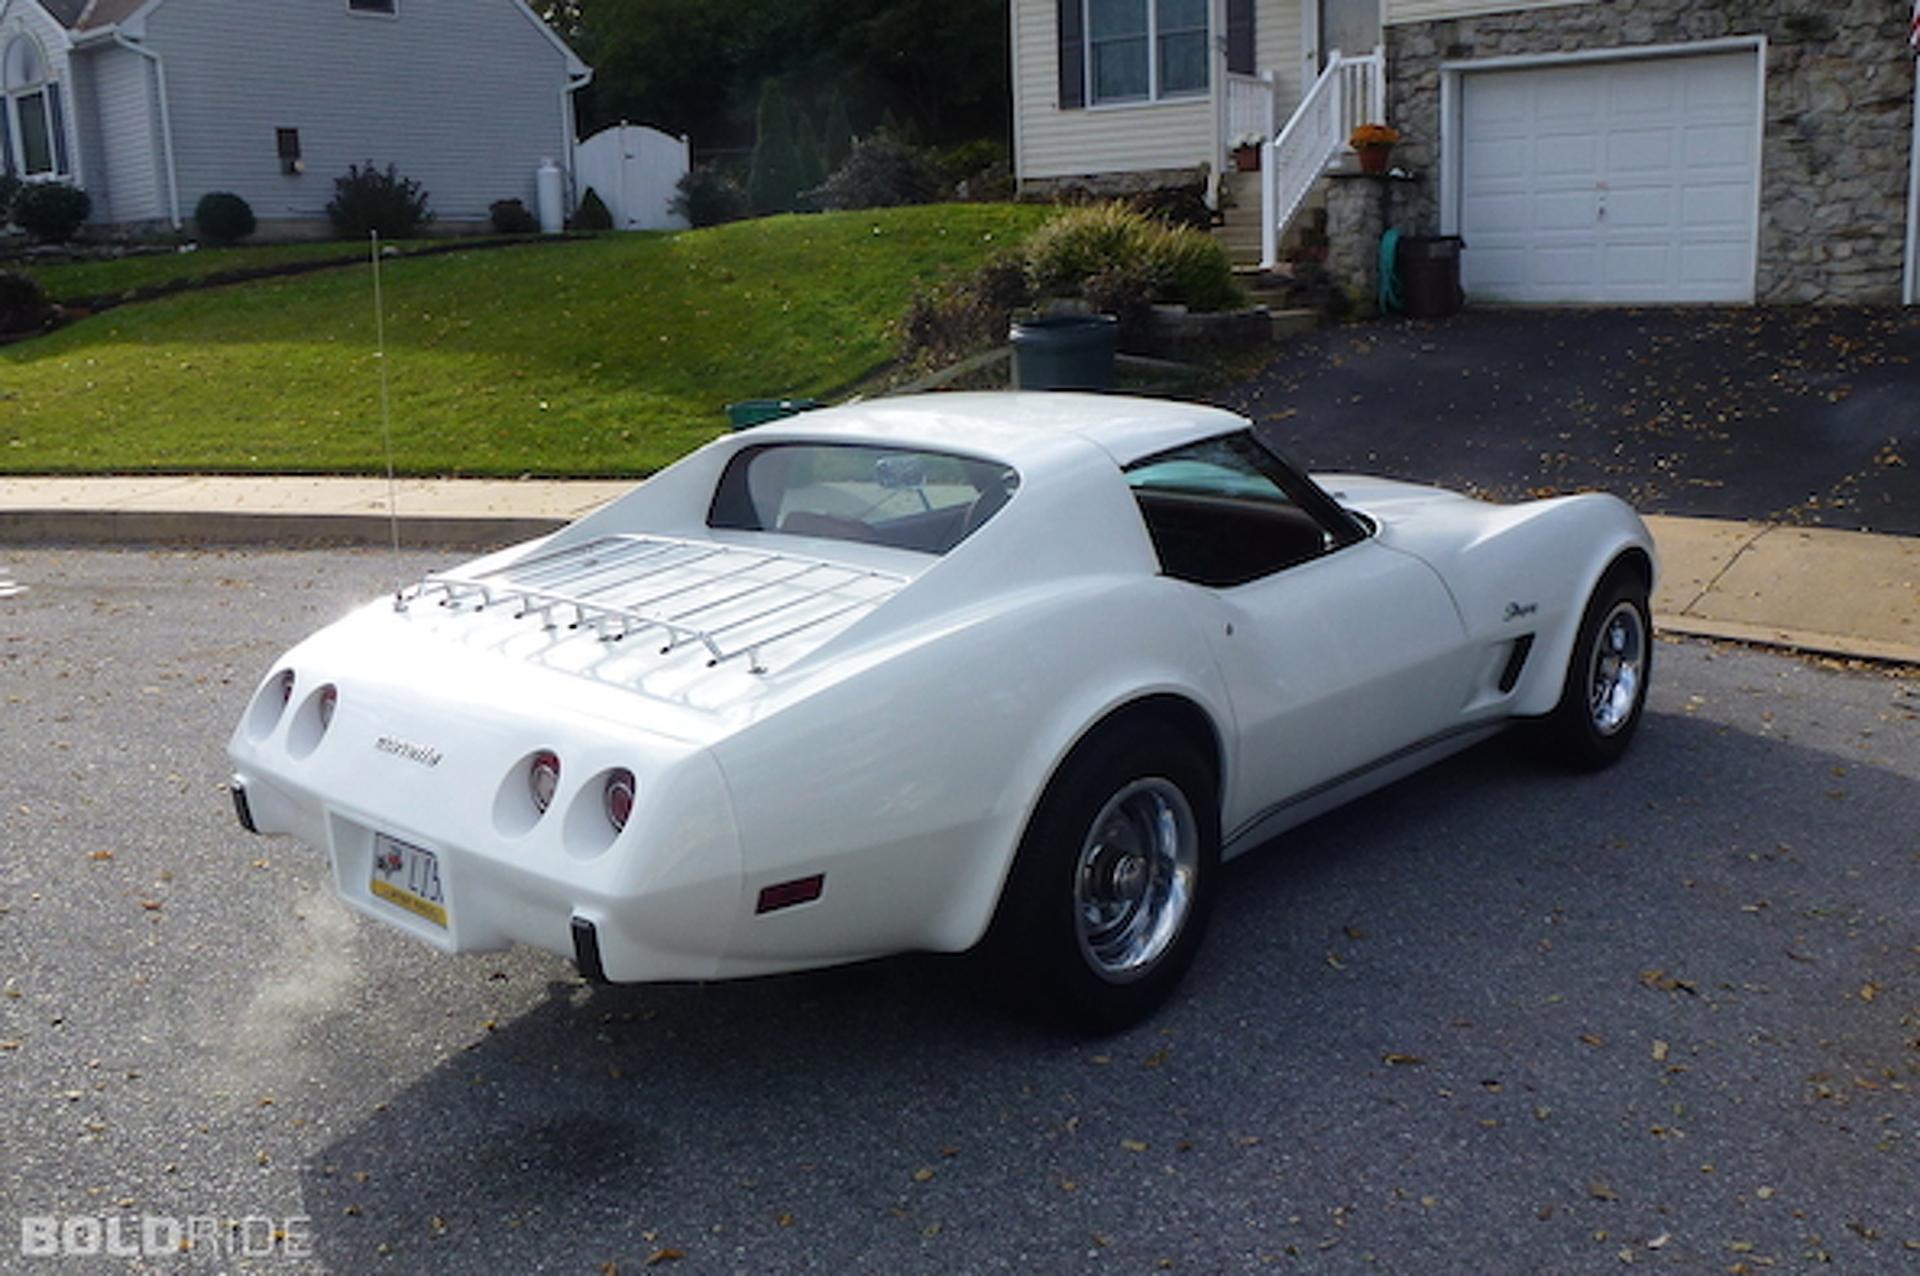 Your Ride: 1976 Chevrolet Corvette Stingray